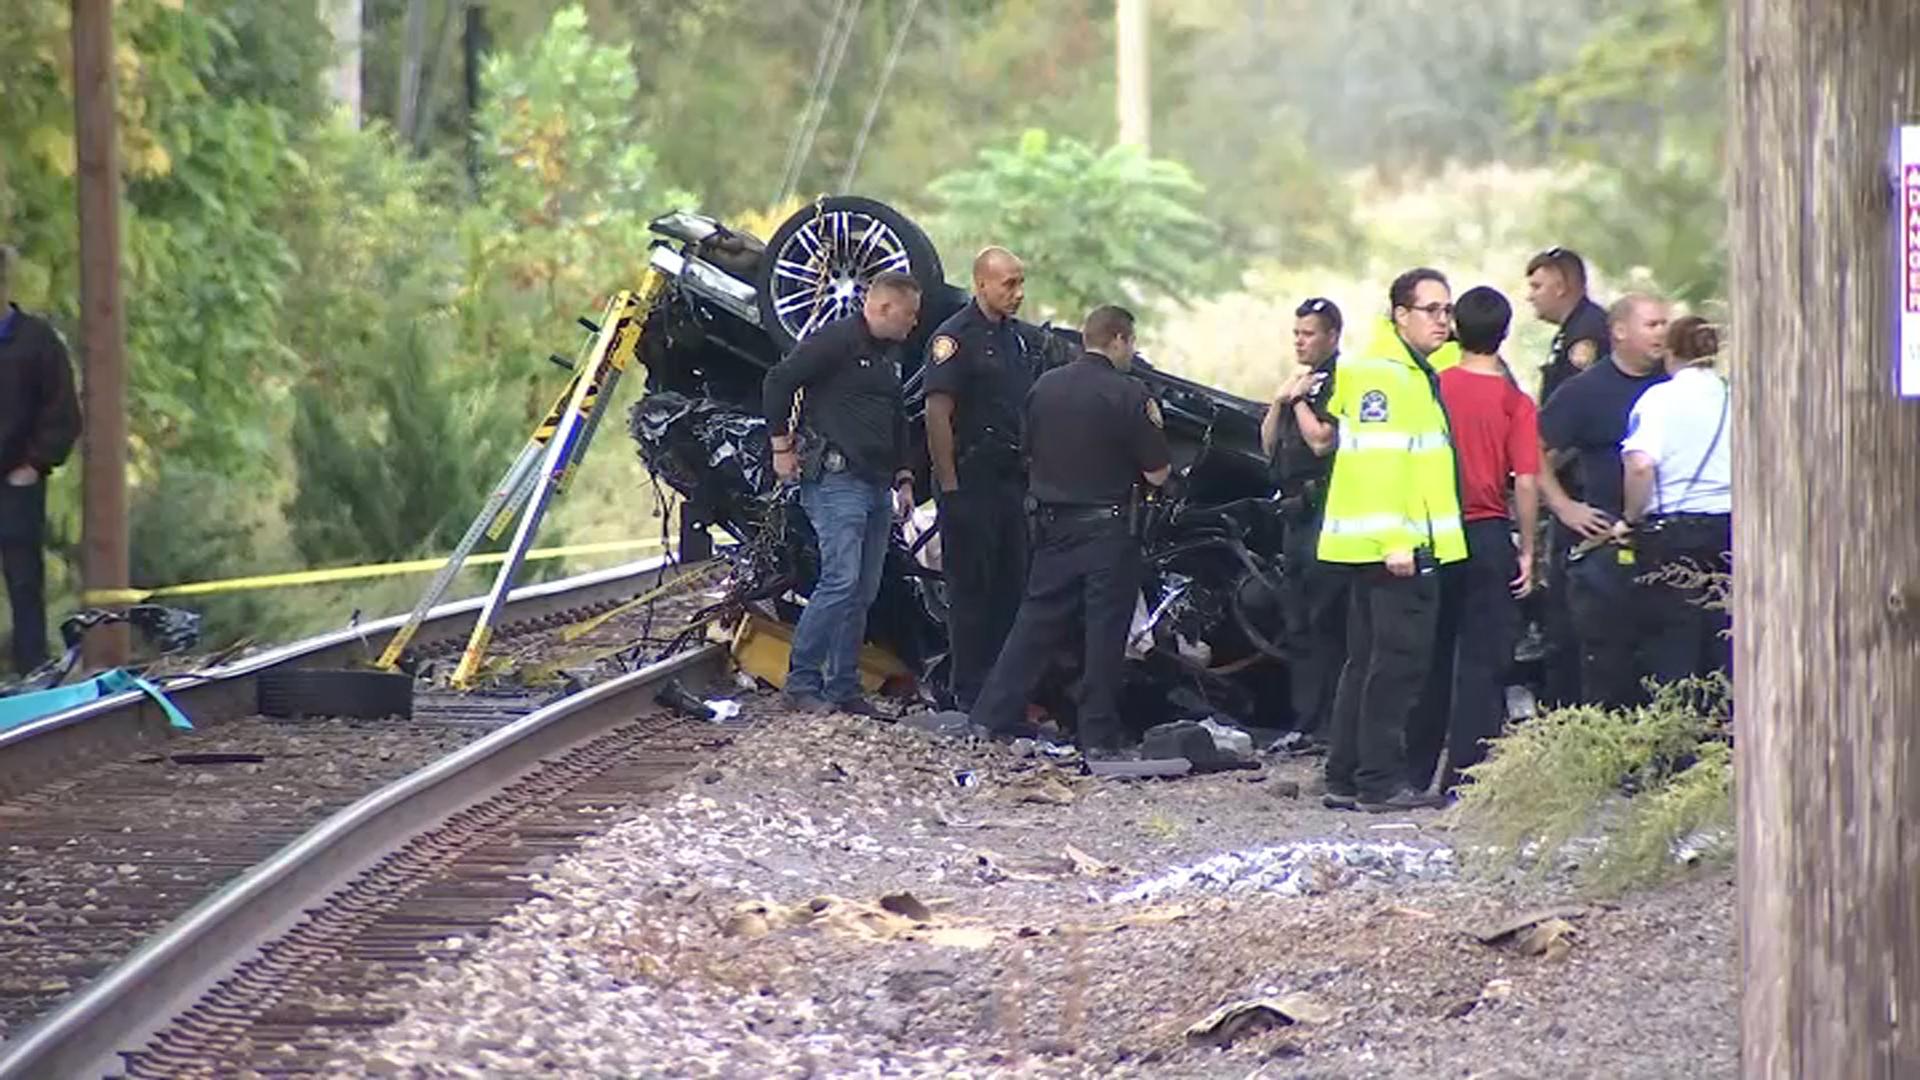 2 Teens Die in Fiery Crash When Porsche Falls From Overpass